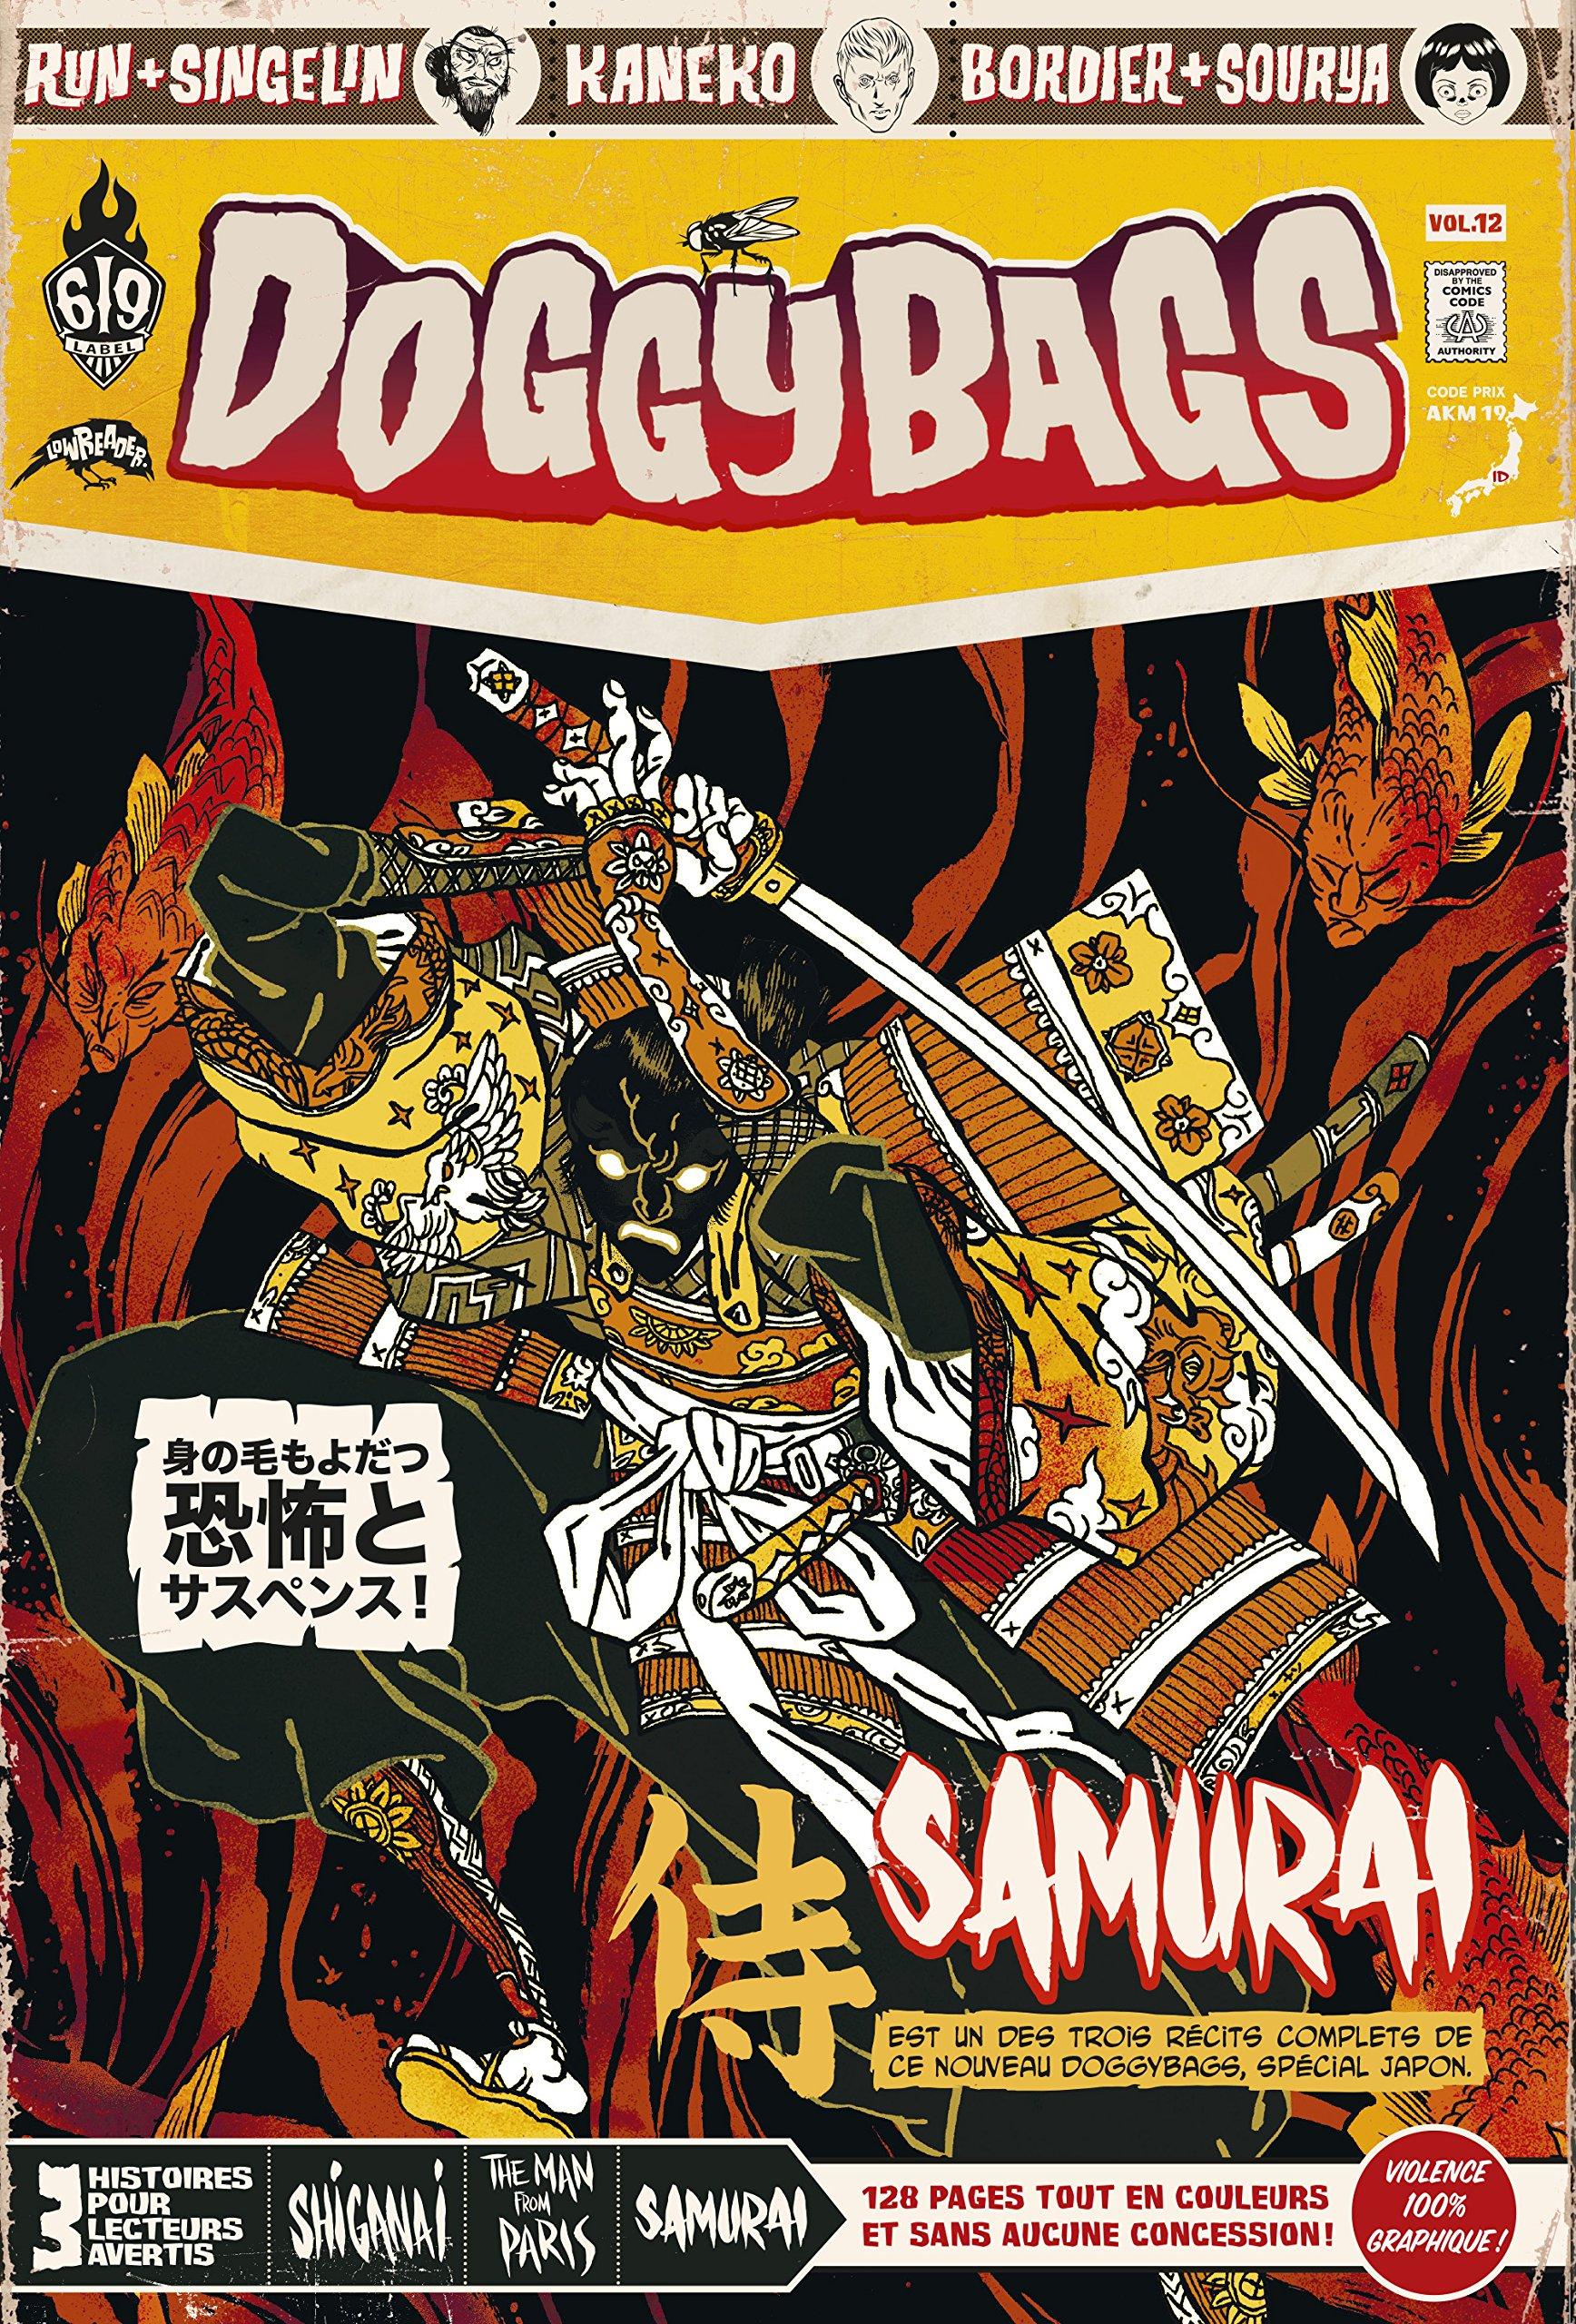 Doggybags 12